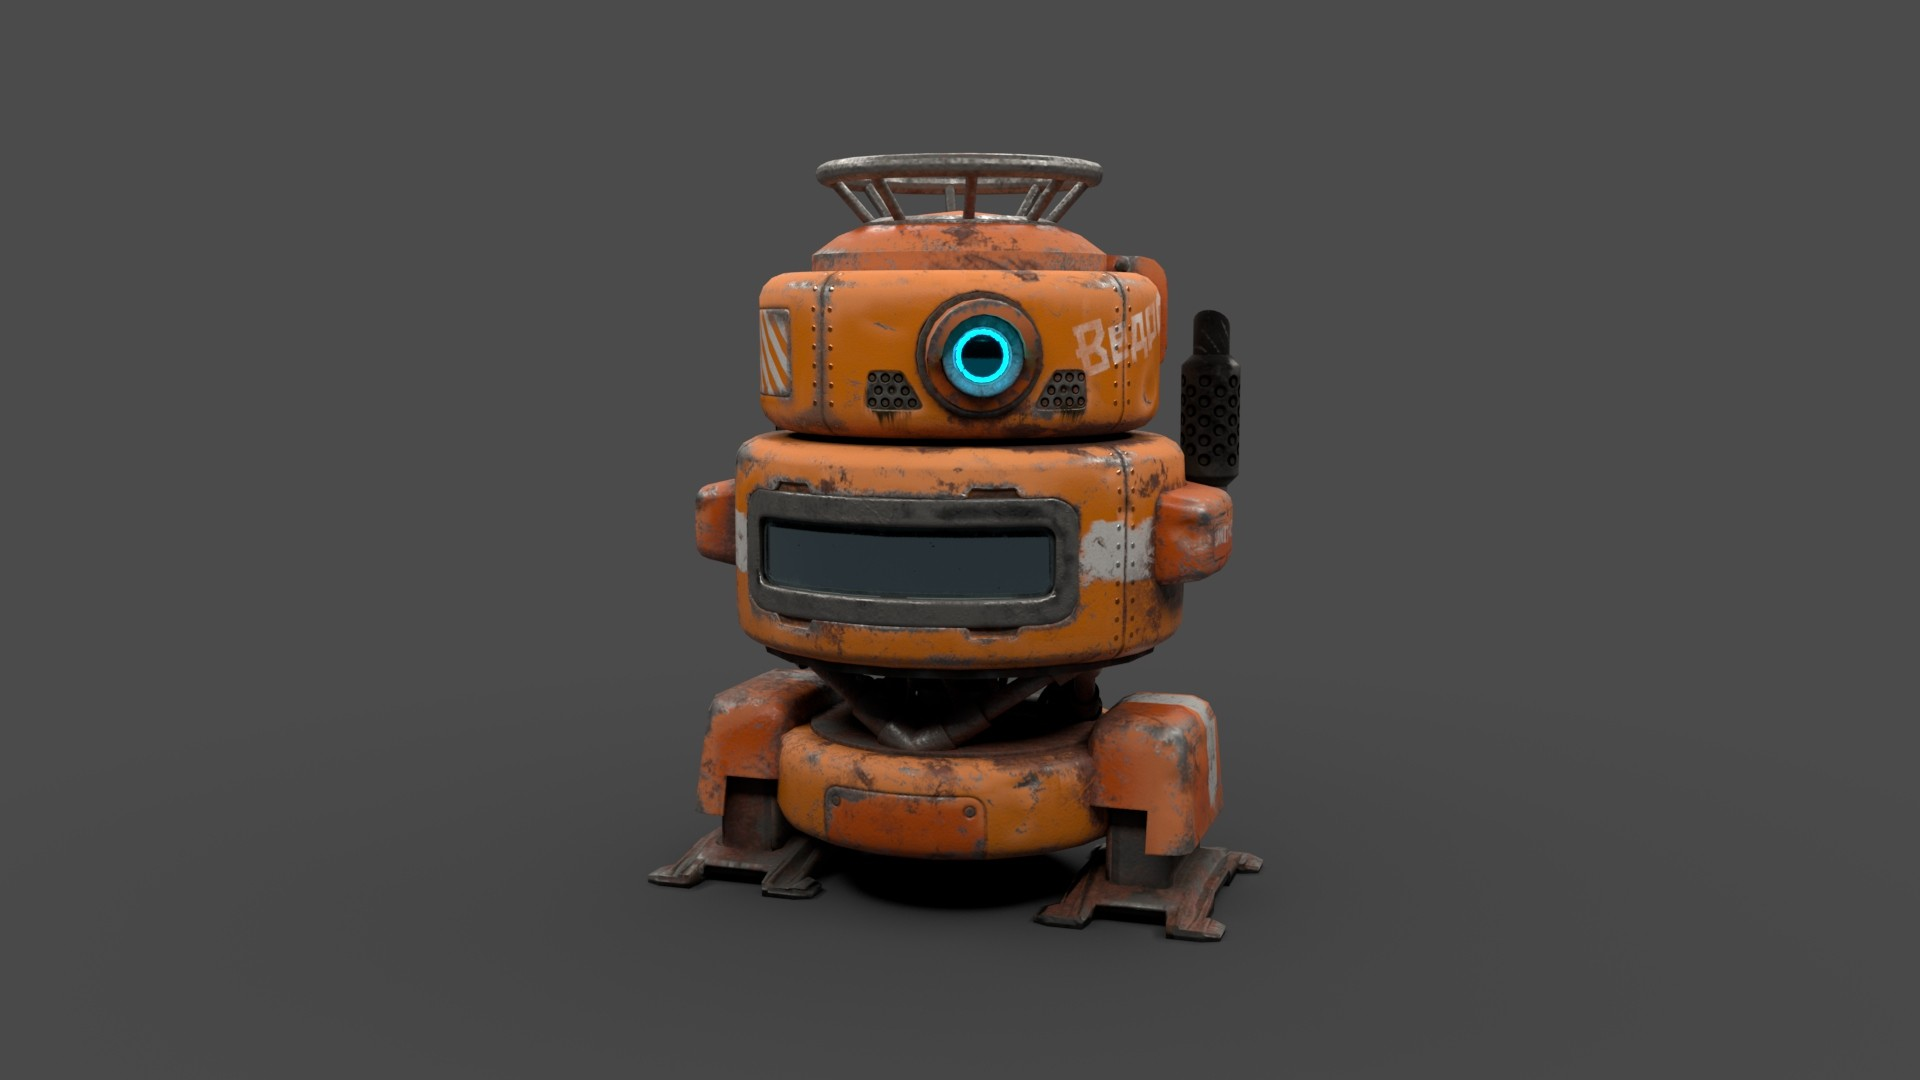 Iain gillespie quarrybot 01 1